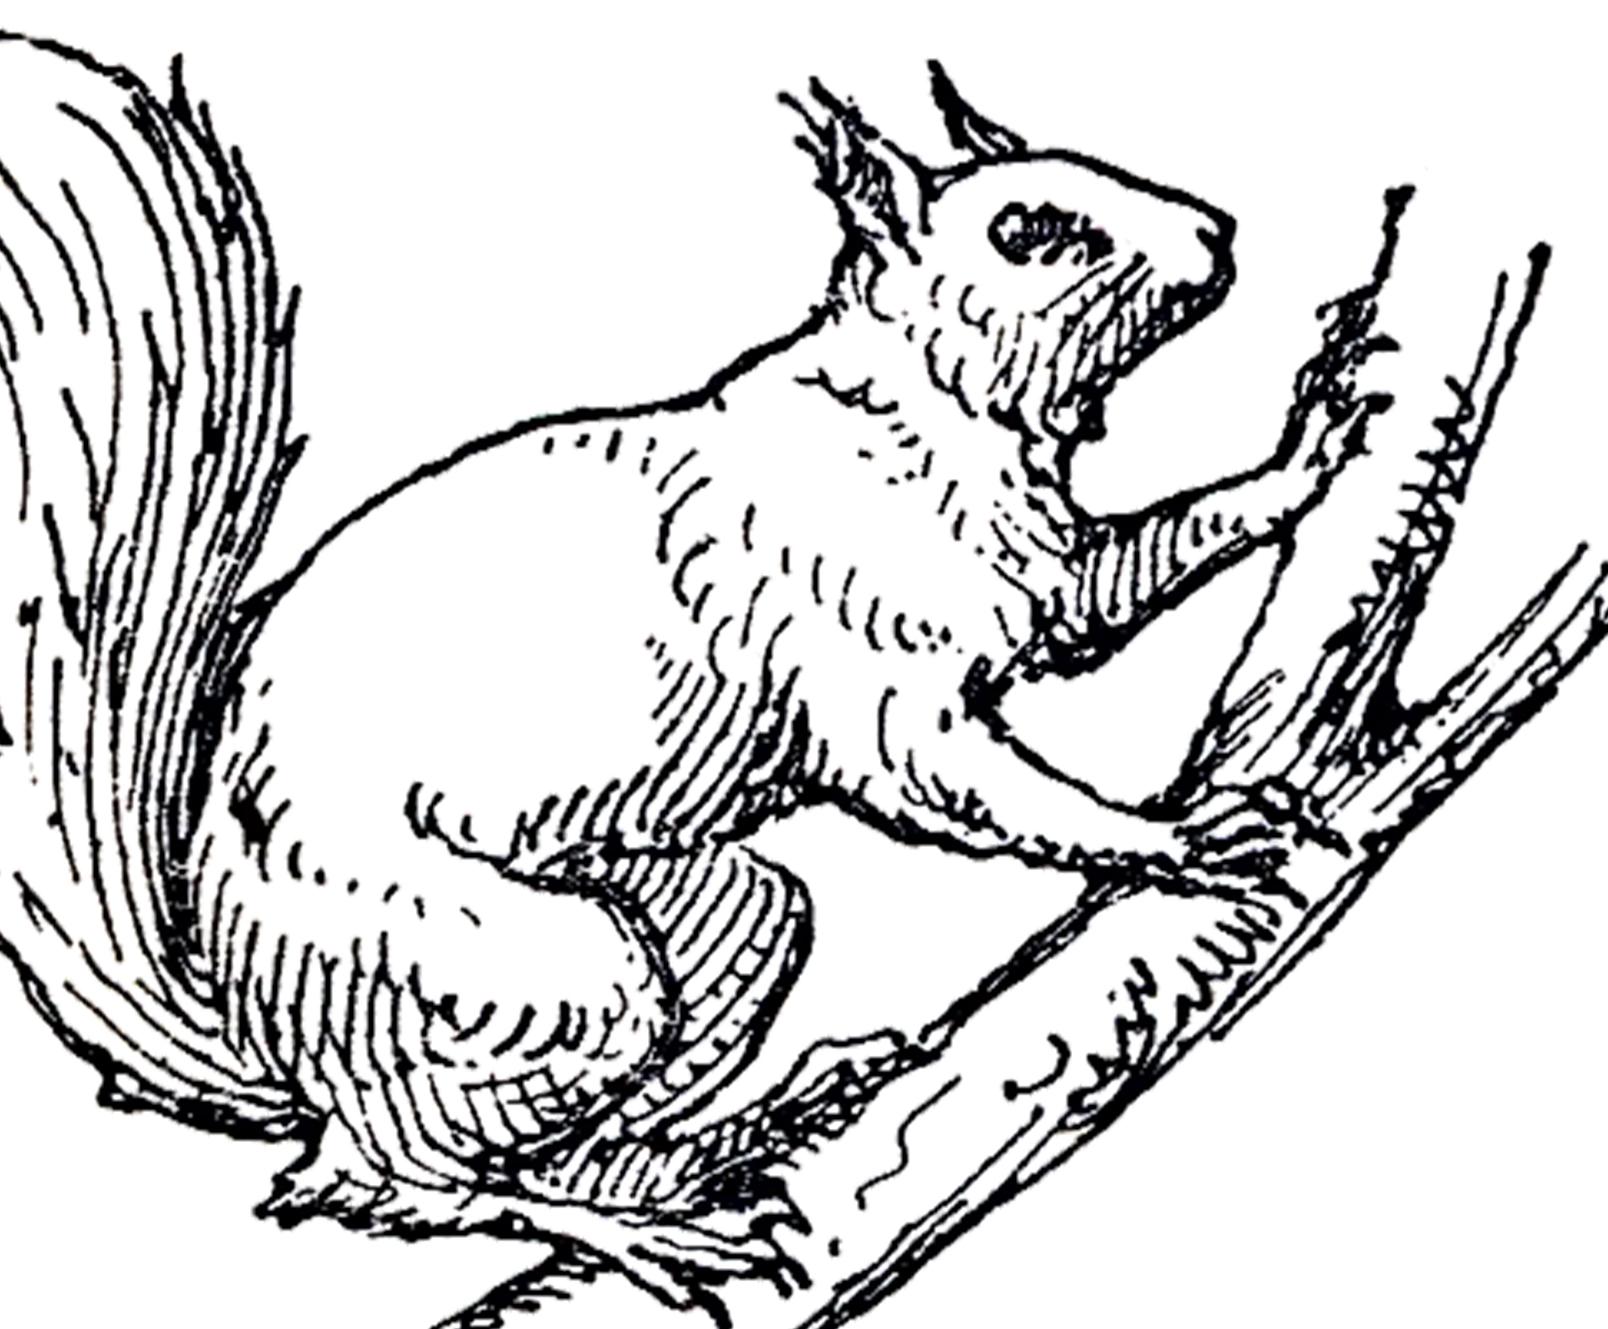 1608x1329 Vintage Squirrel Illustration Squirrel Illustration, Squirrel